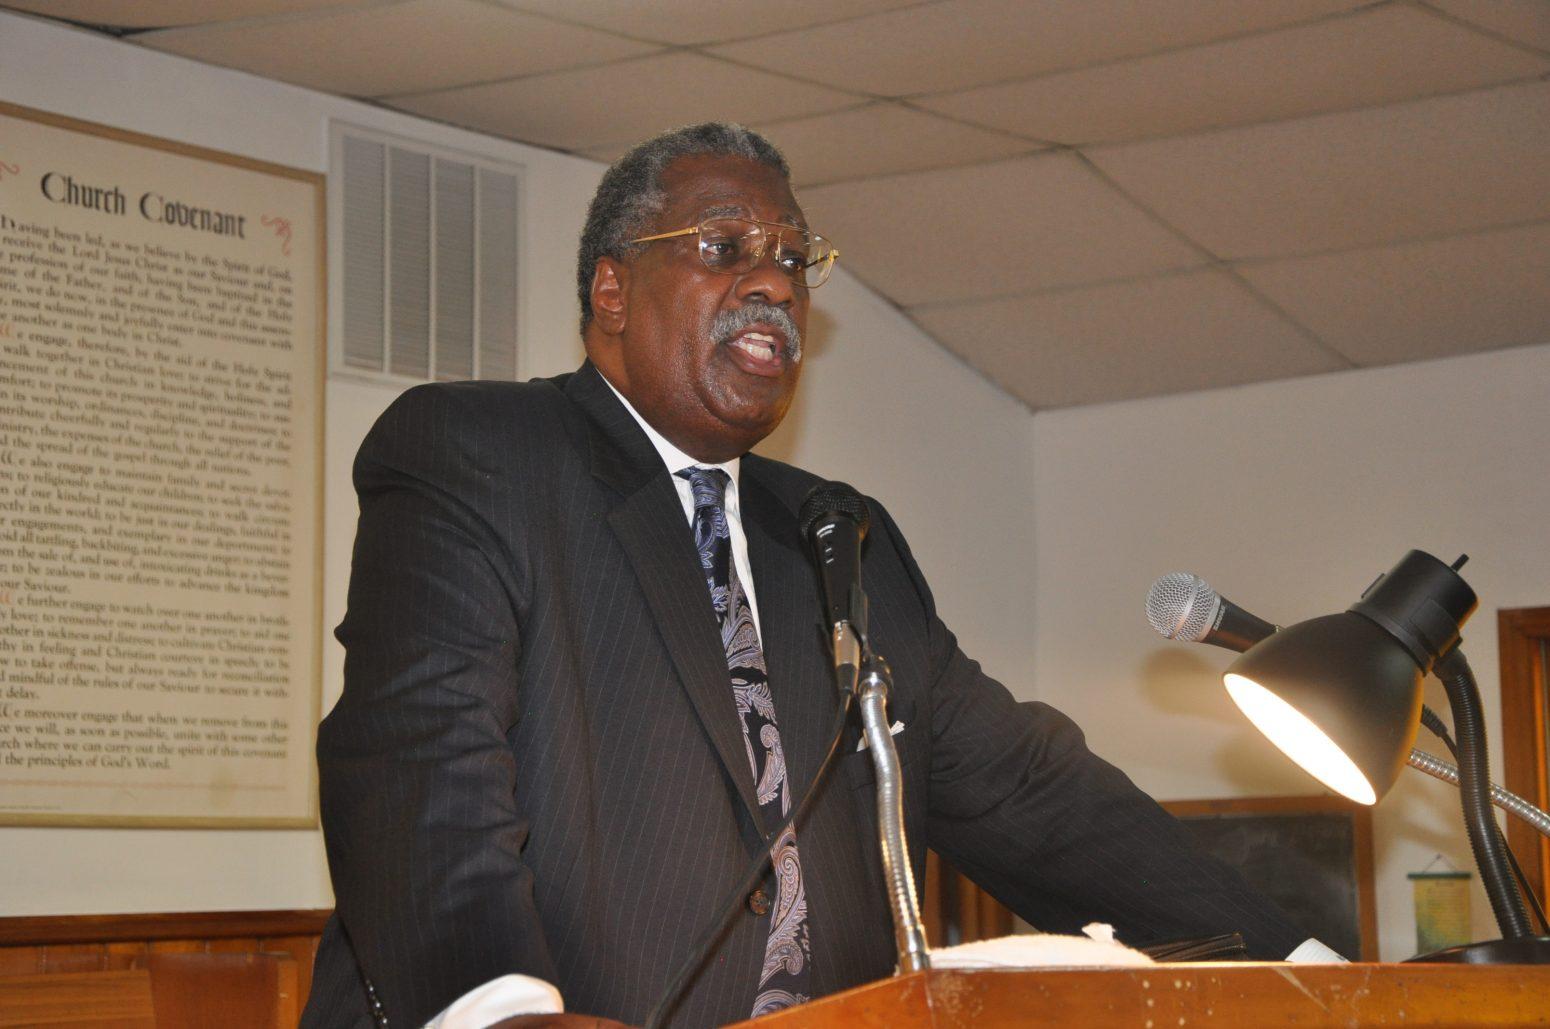 Rev. Nick Clayton's faithfulness extends his grandpa's vision at St. Paul church